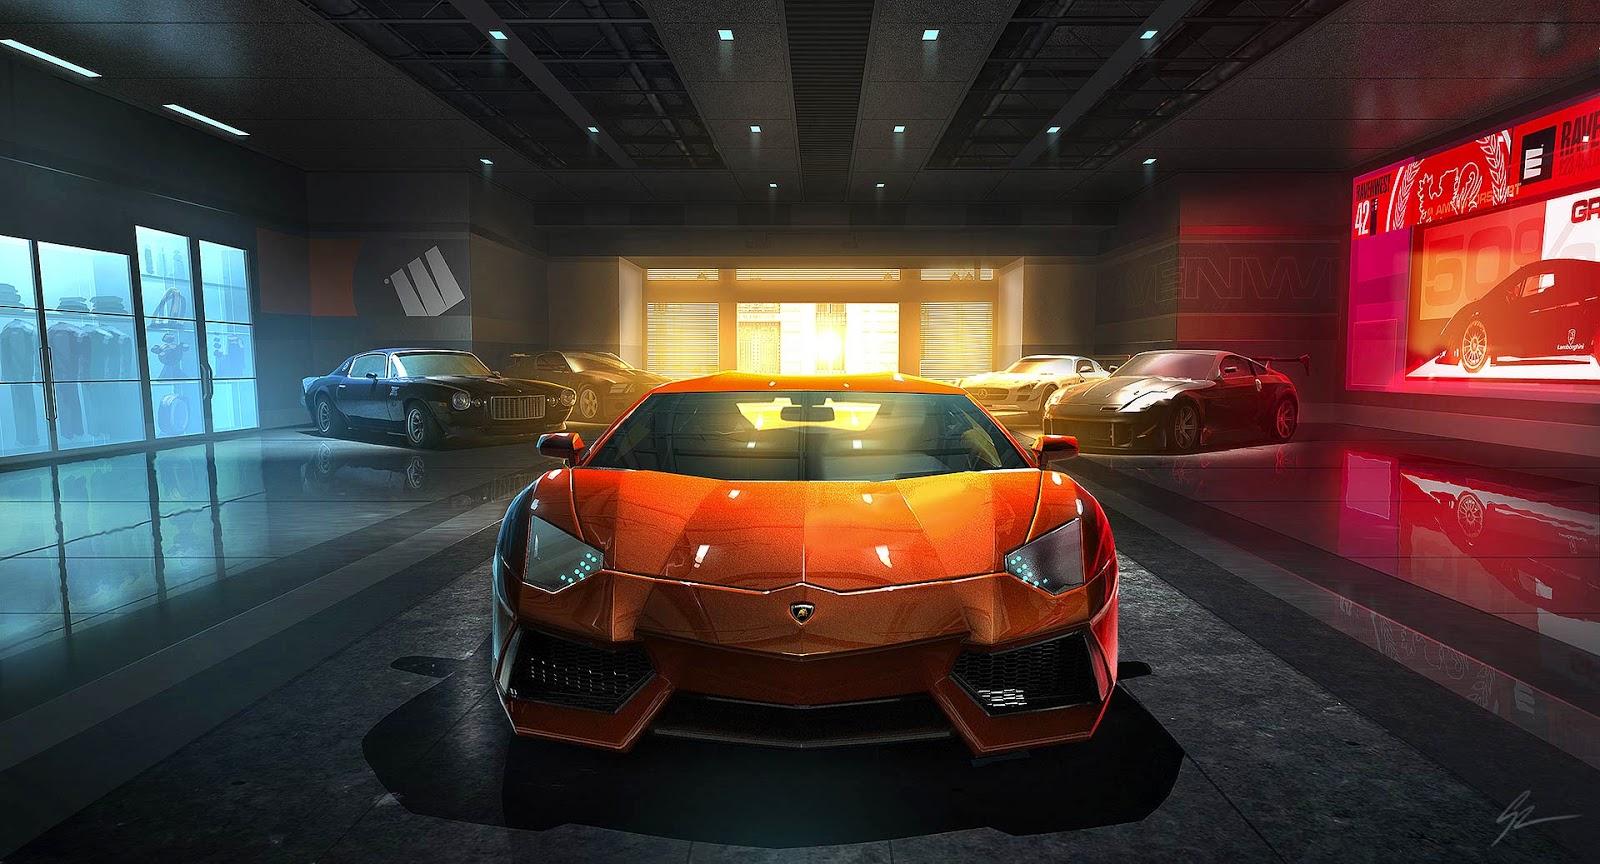 Papel de Parede Carro Esportivo Lamborghini para pc 3d hd grátis Sports car desktop hd wallpaper image free